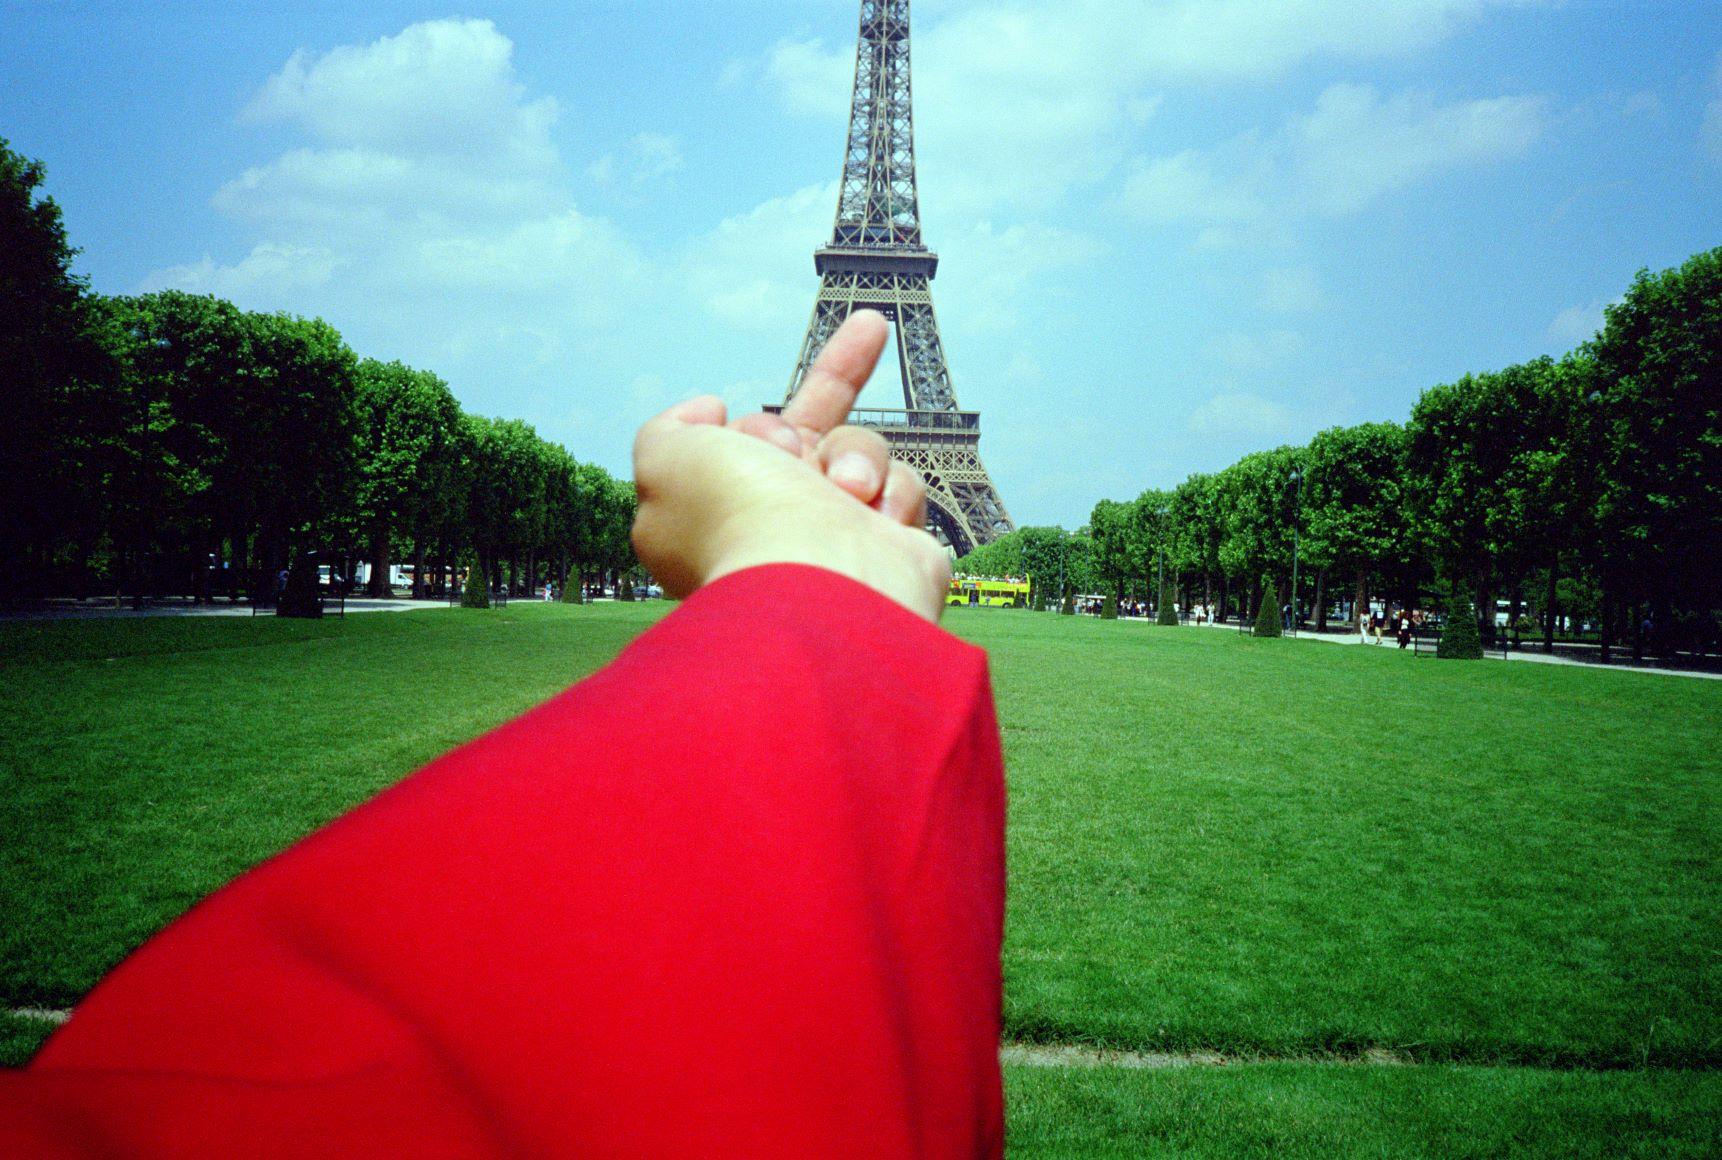 Ai_Weiwei_Study_of_Perspective_1995_2011_Eiffel_Tower_Paris_1999__Image_Courtesy_Ai_Weiwei_studio